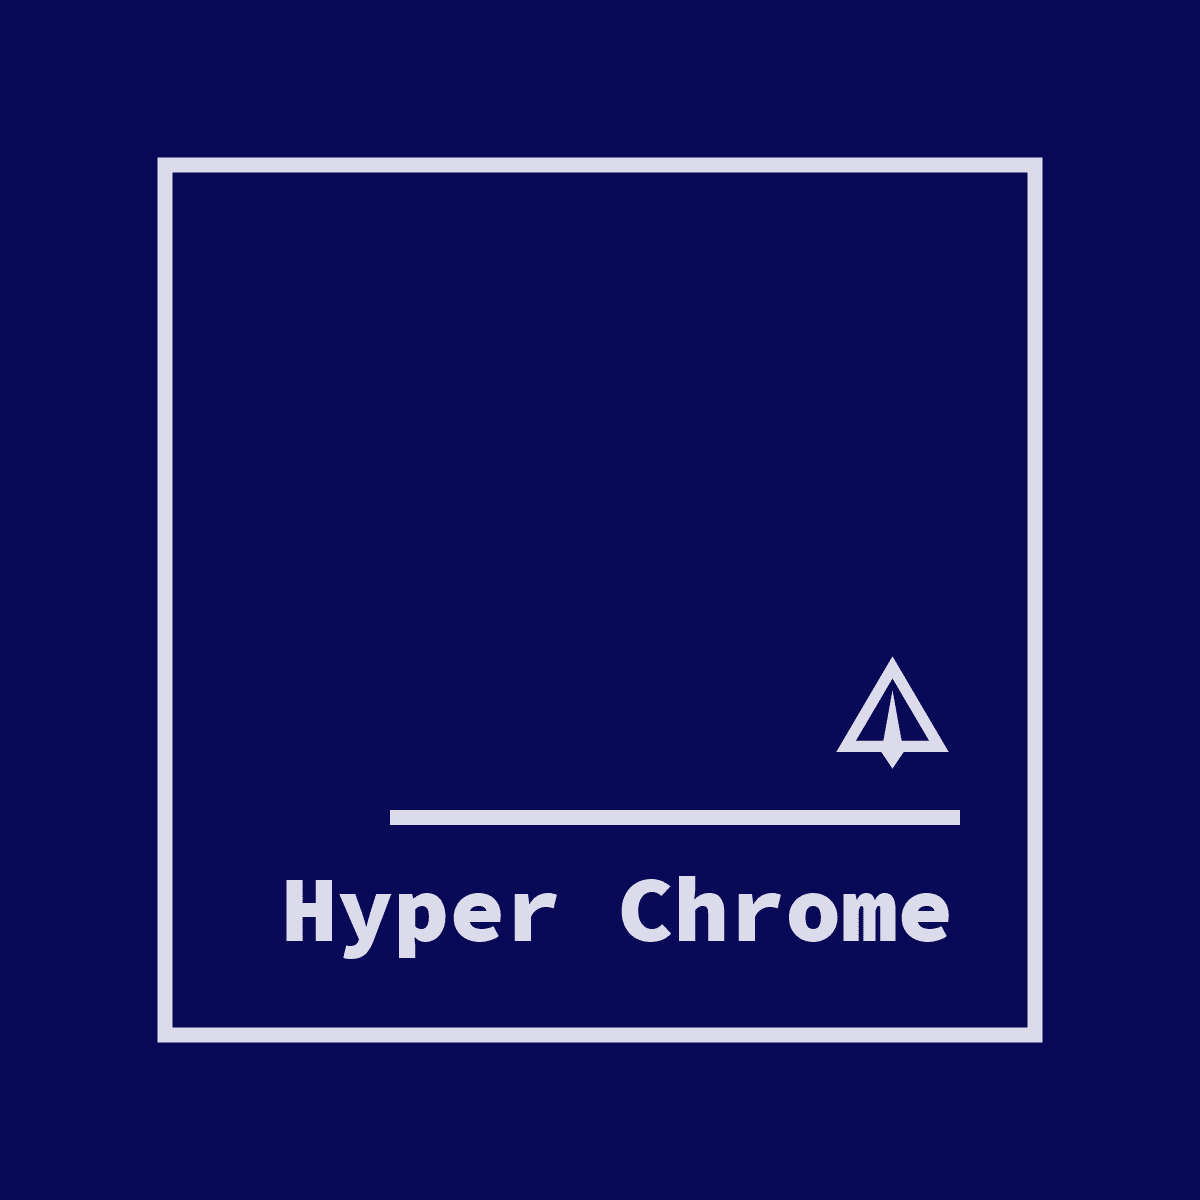 Hyper Chrome